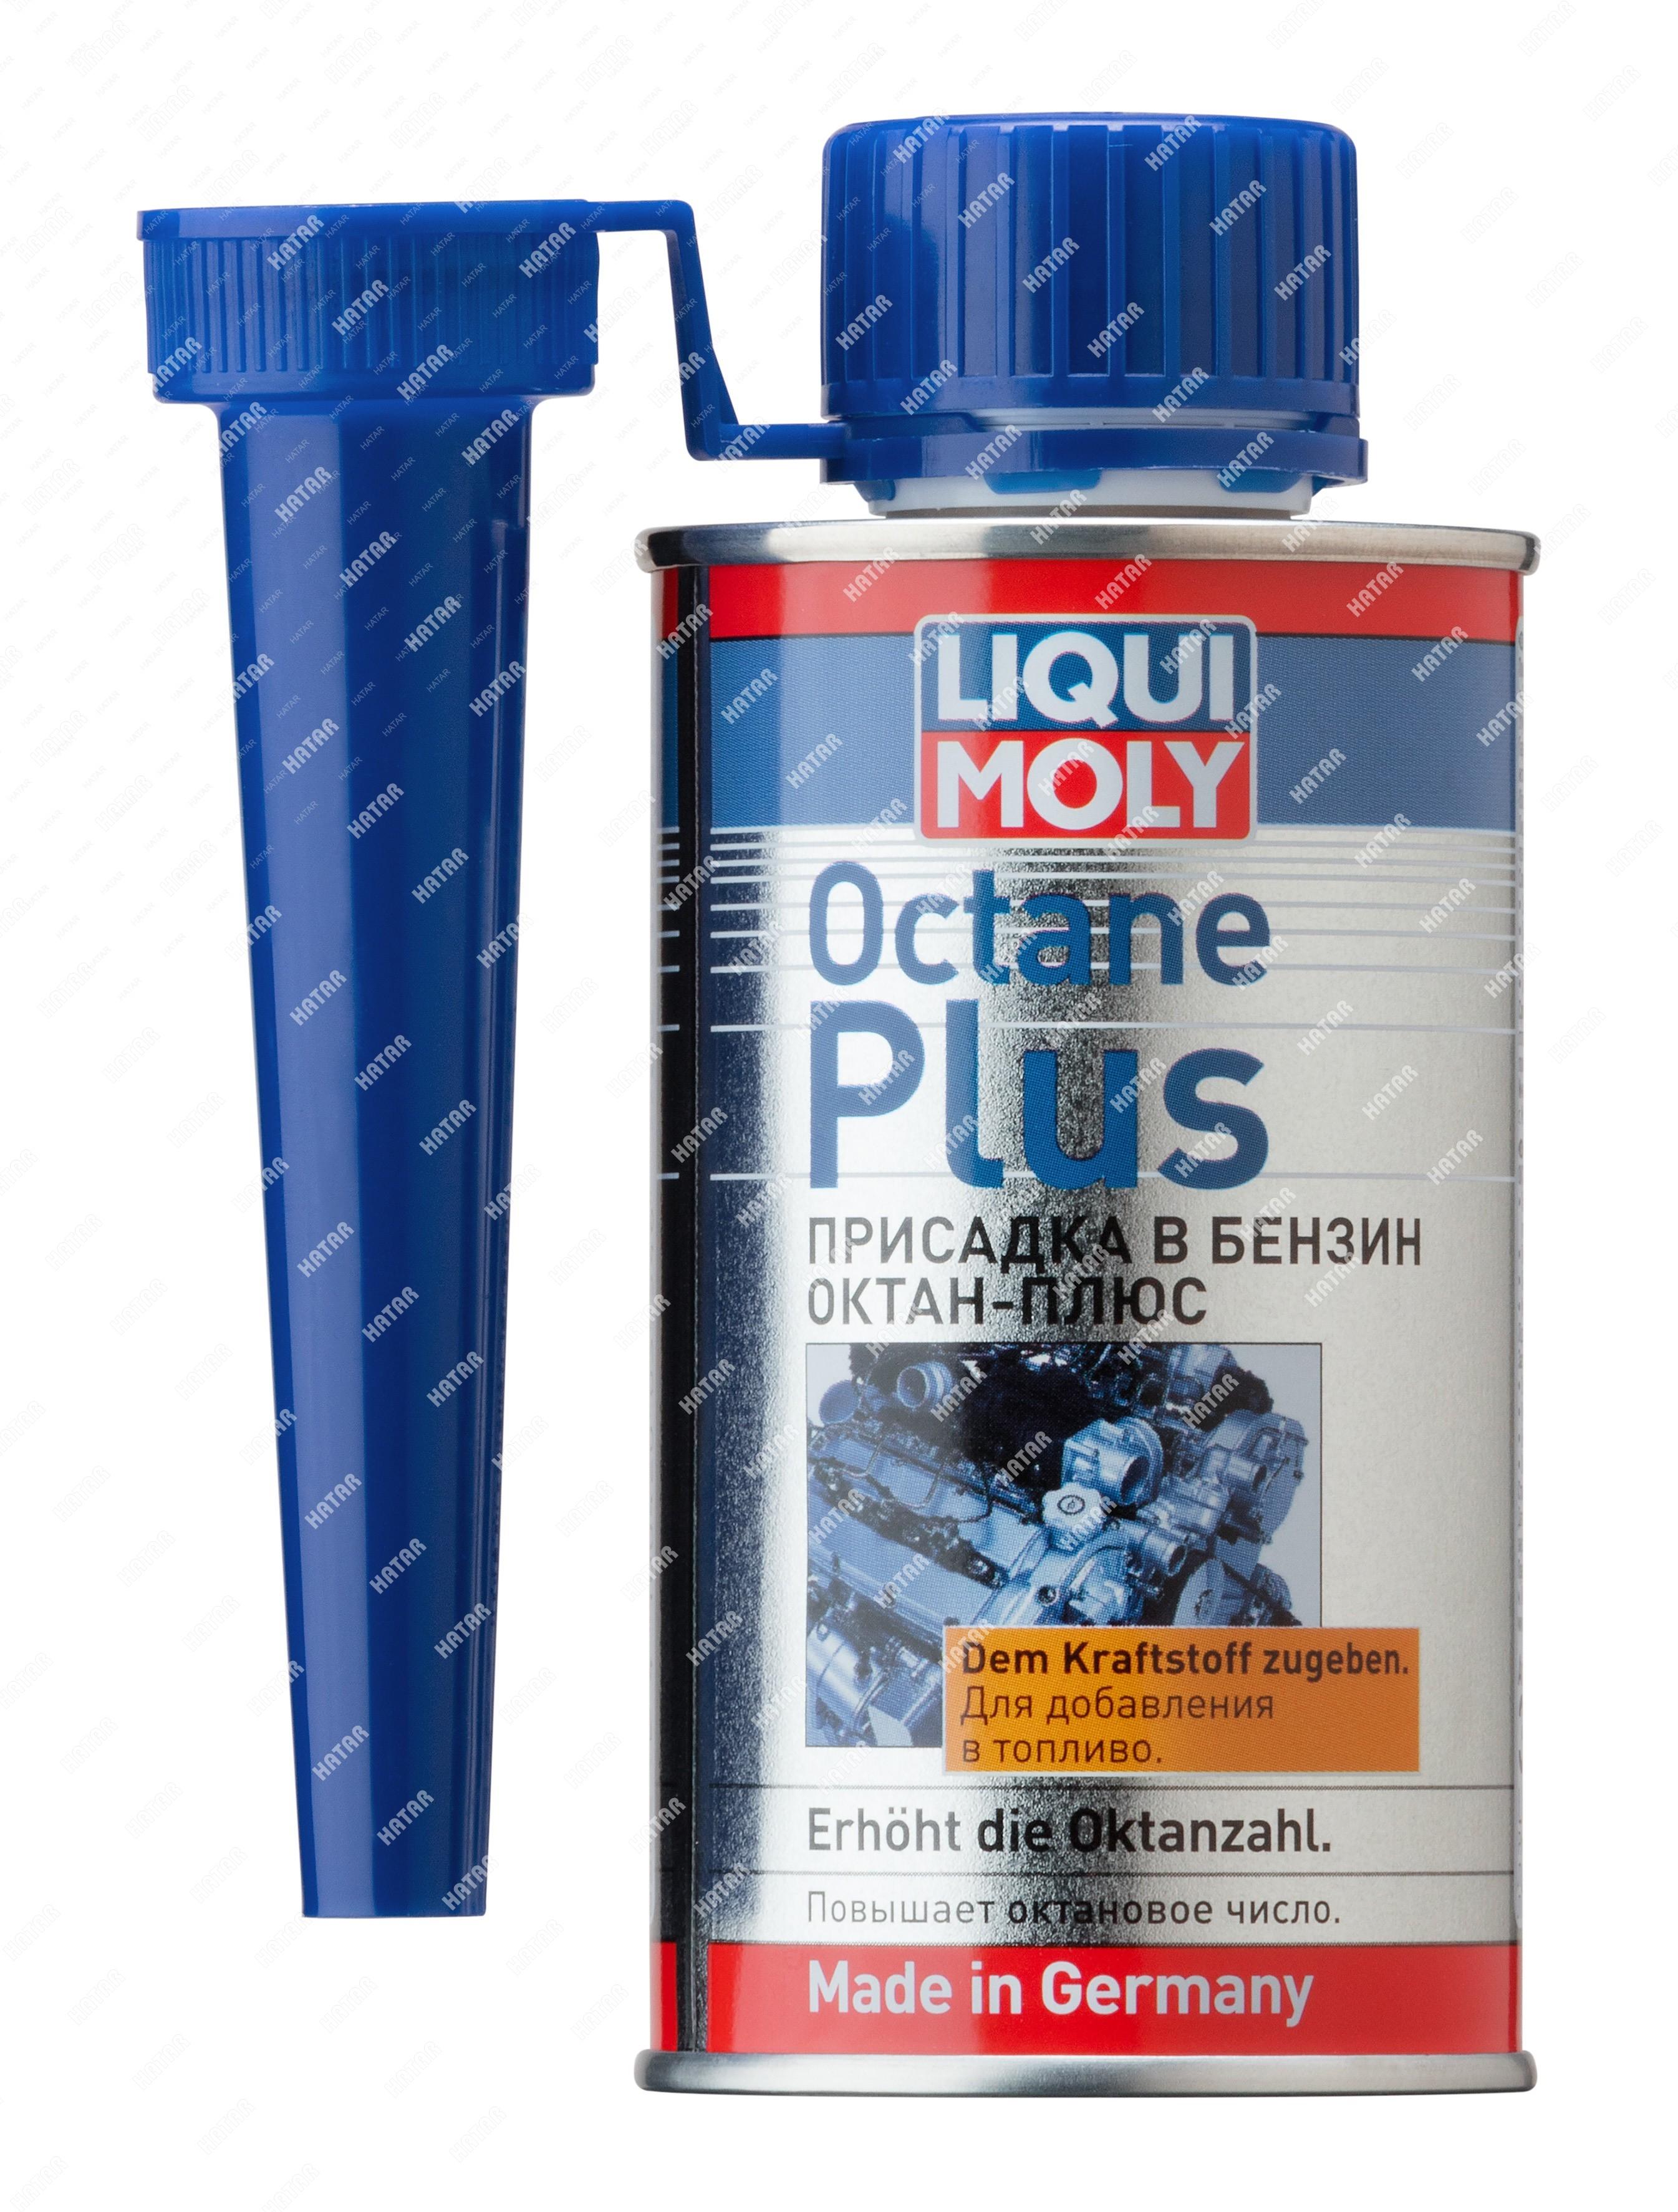 LIQUI MOLY Октан плюс octane plus (0,15л)